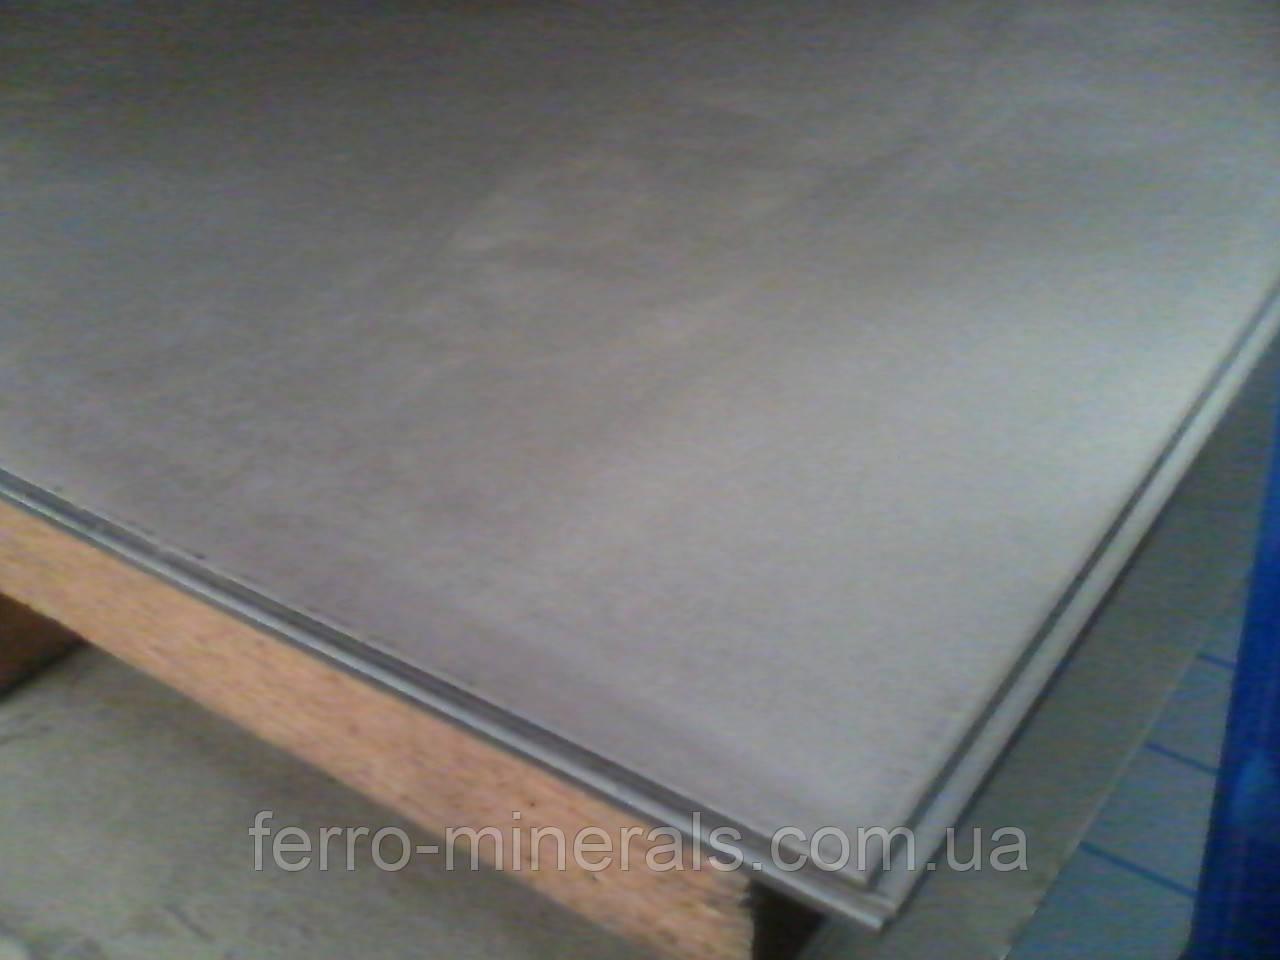 Нержавеющий лист 3,0х1000х2000мм,  AISI 321 (08X18H10Т), 2В